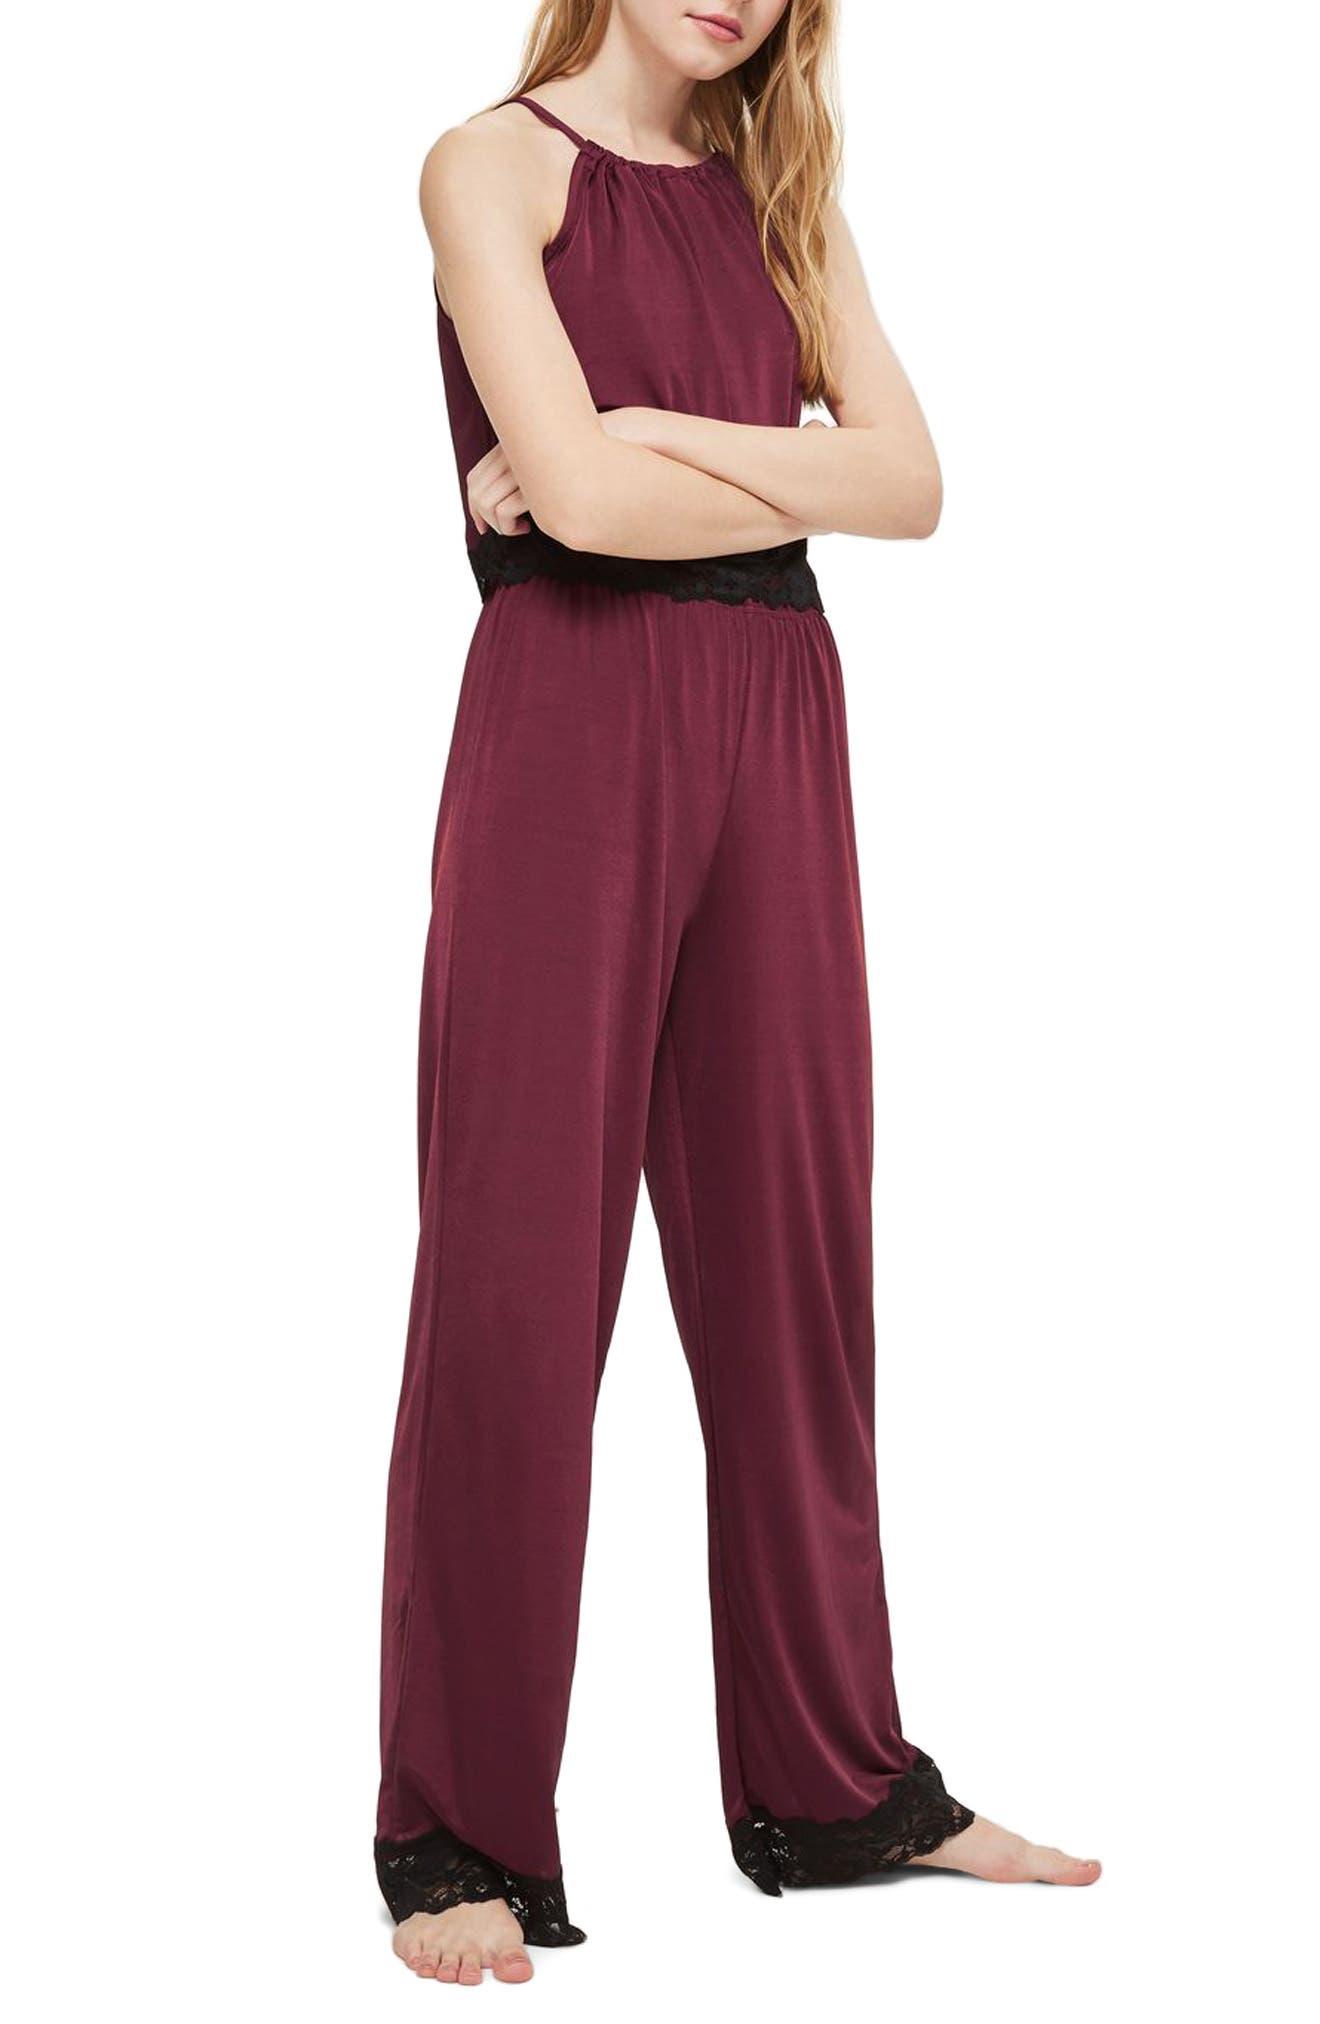 Jersey Satin & Lace Pajama Pants,                         Main,                         color, Berry Multi